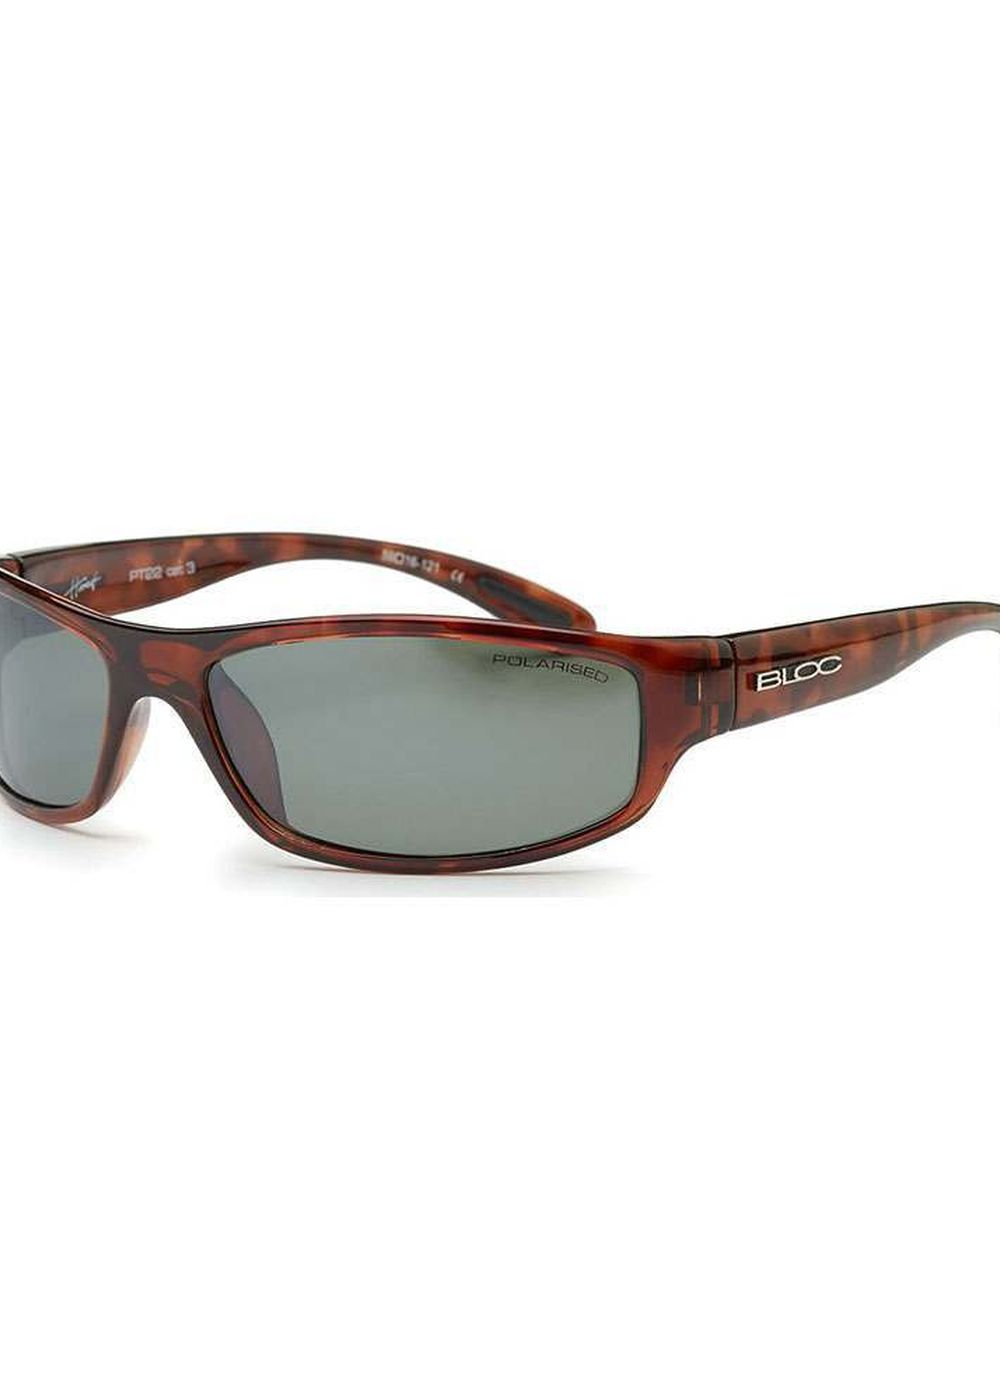 bloc-hornet-sunglasses-shiny-tortpolarised-green